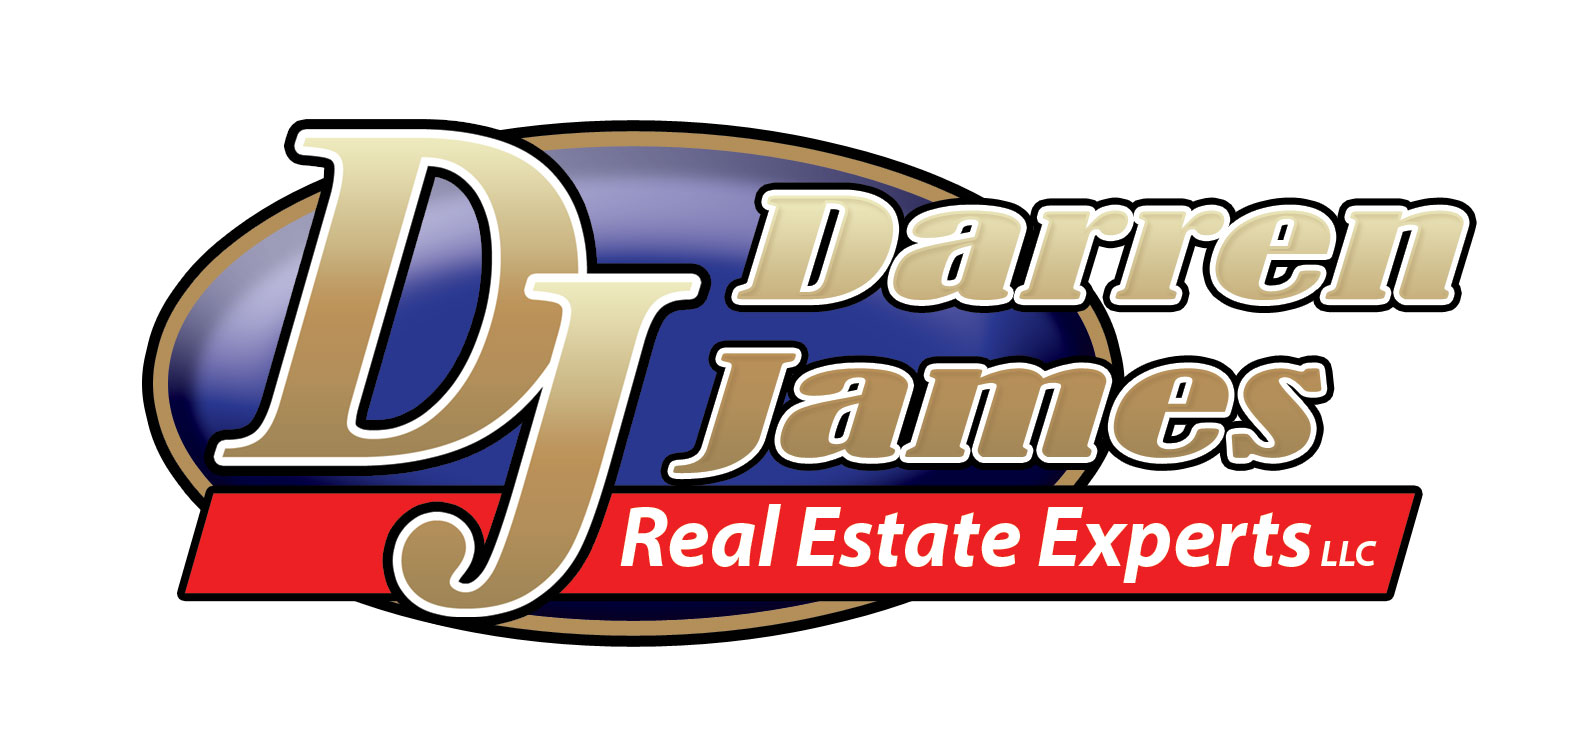 Darren James Real Estate Experts, Llc